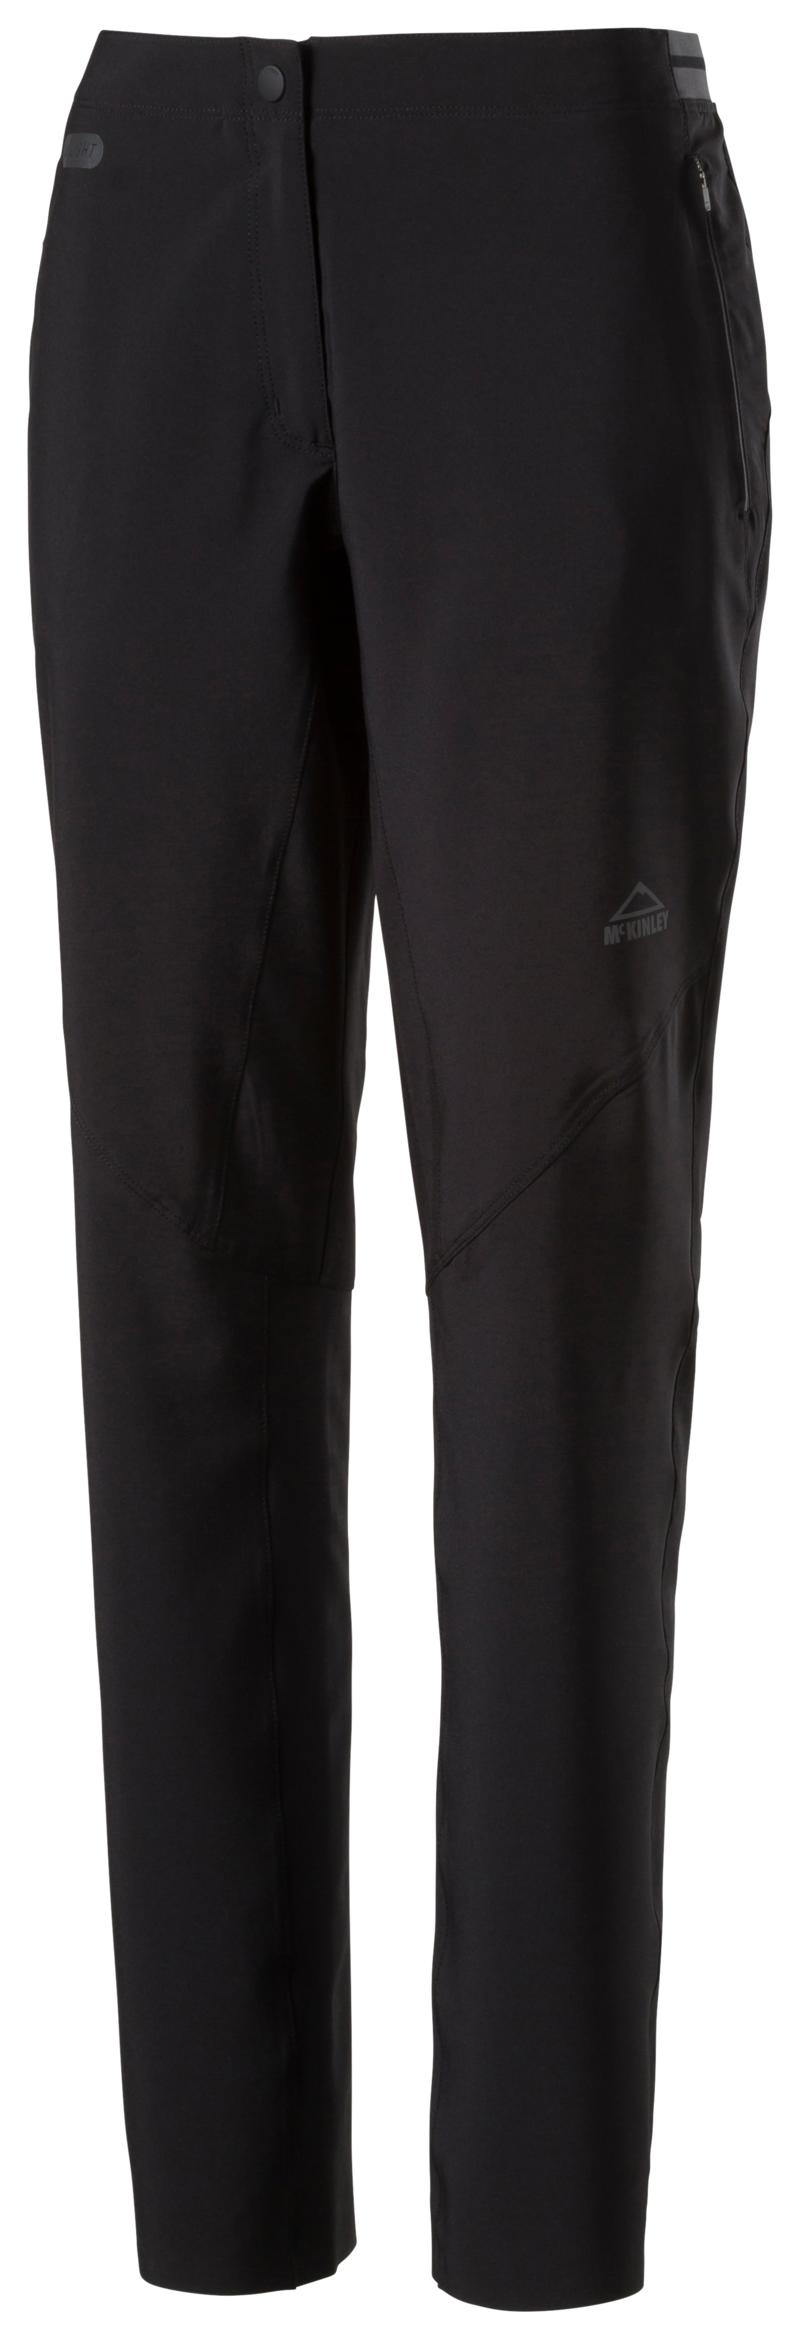 McKinley Salem Wms, ženske pohodne hlače, črna